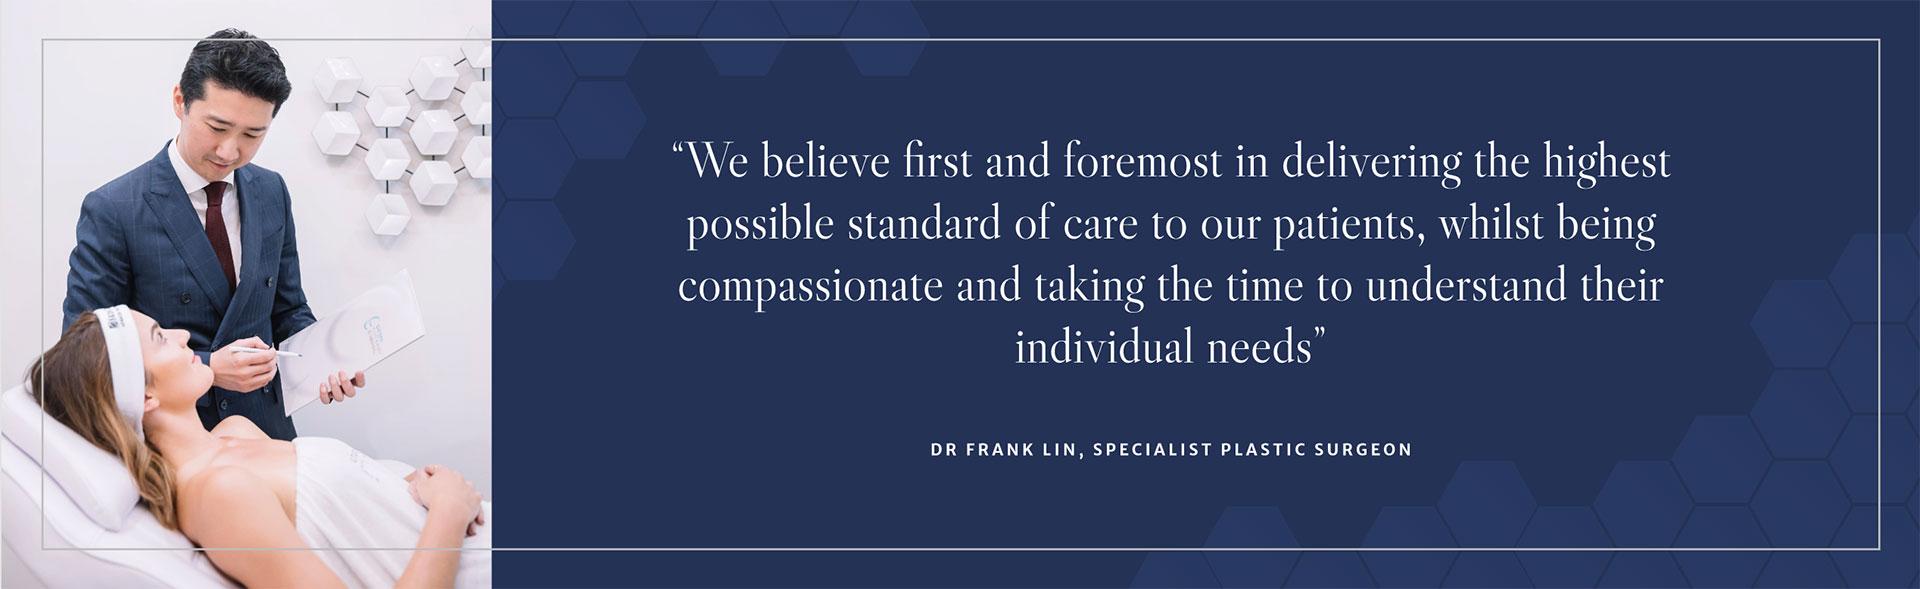 Eastern Plastic Surgery- Dr Frank Lin Specialist Plastic Surgeon